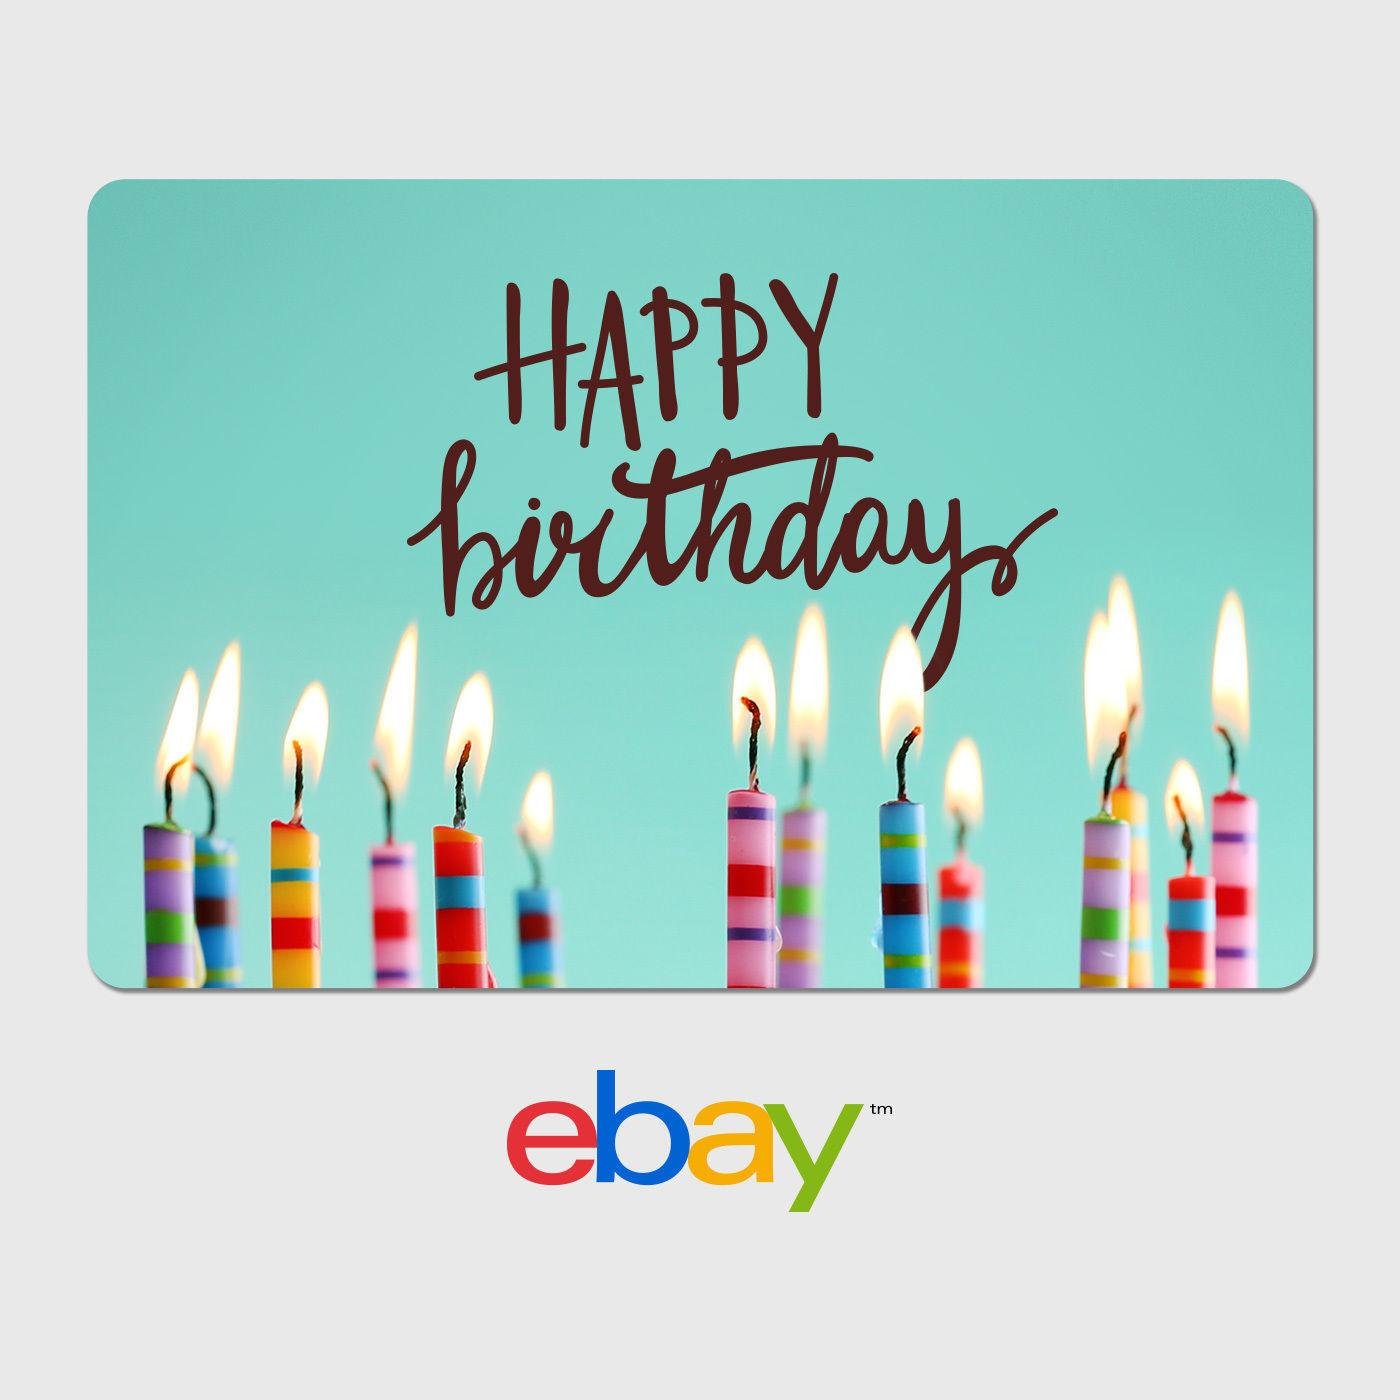 Купить eBay Digital Gift Card - Happy Birthday Candles -  Fast email delivery